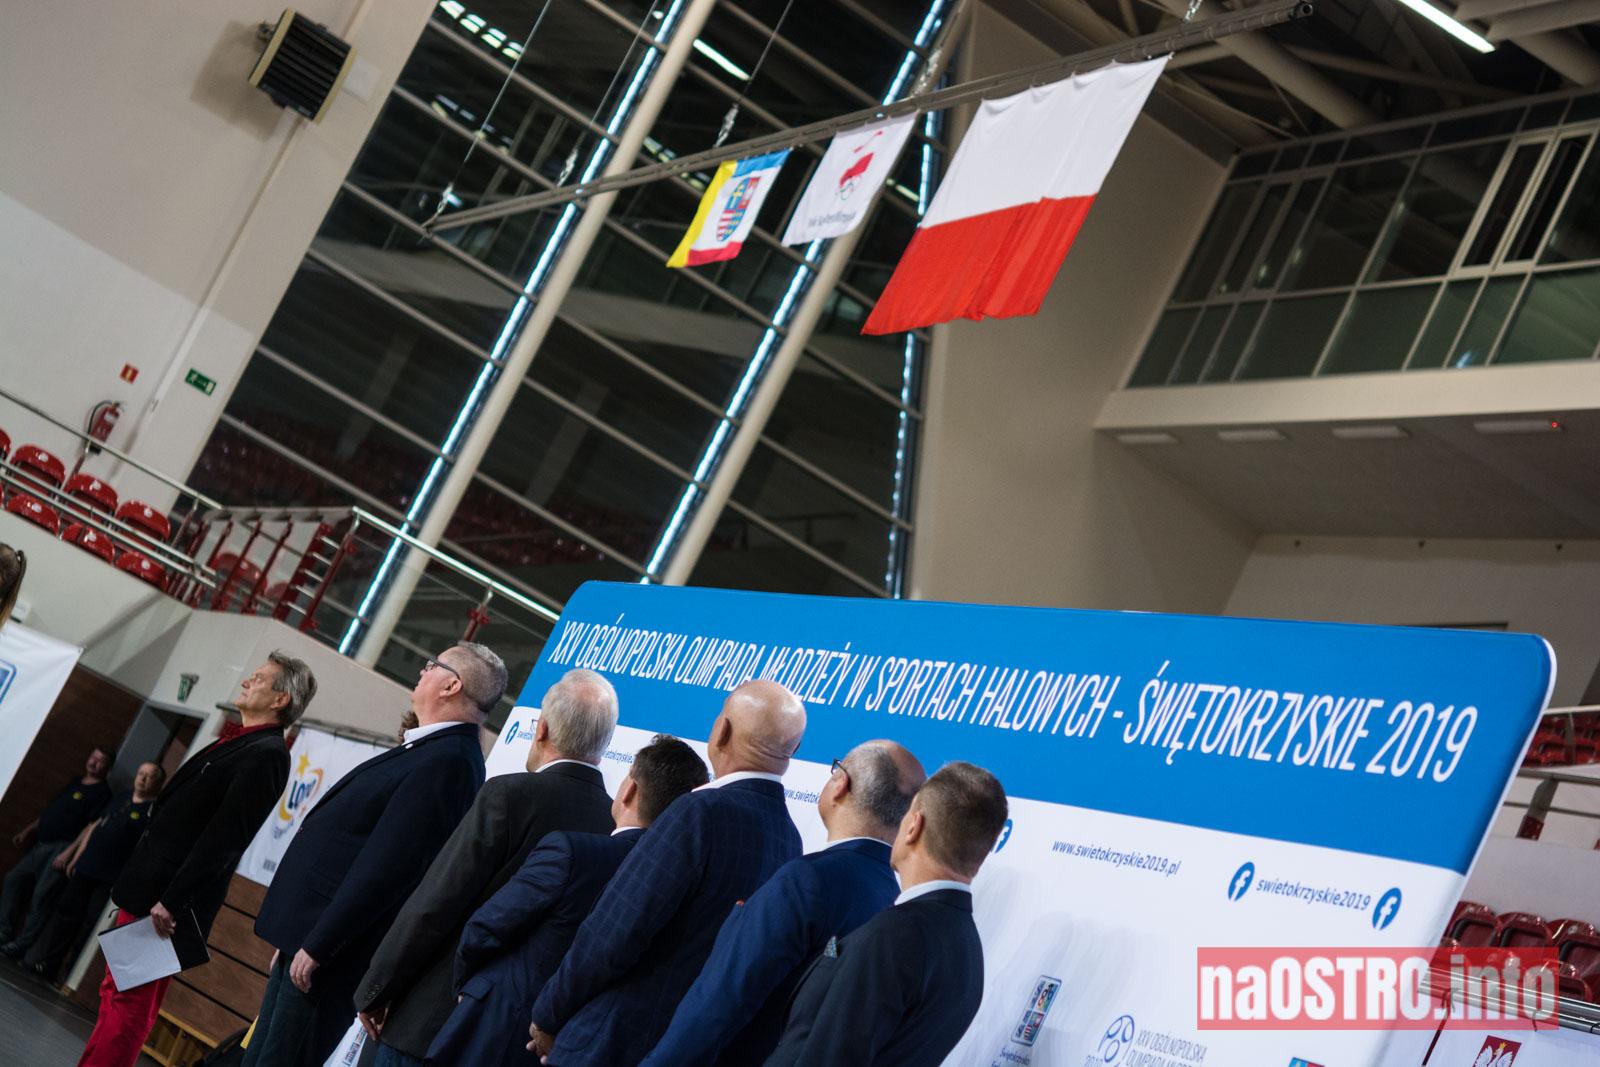 NaOSTRO Olimpiada otwarcie-32